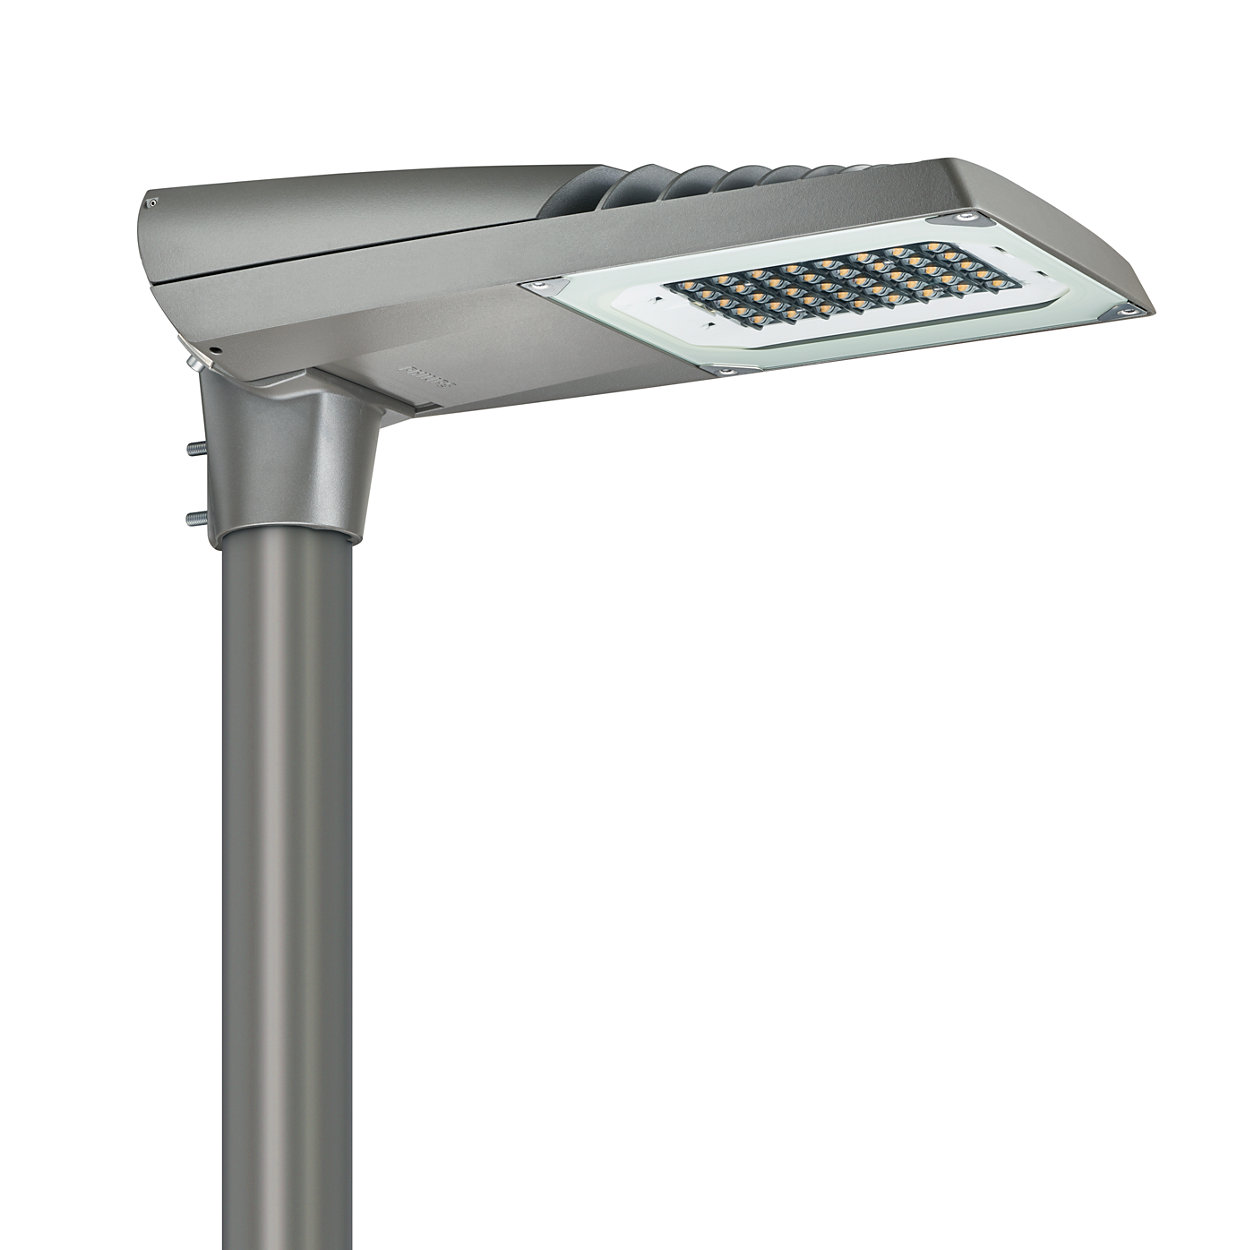 Luma gen2 Solar – Using solar power to light up your streets